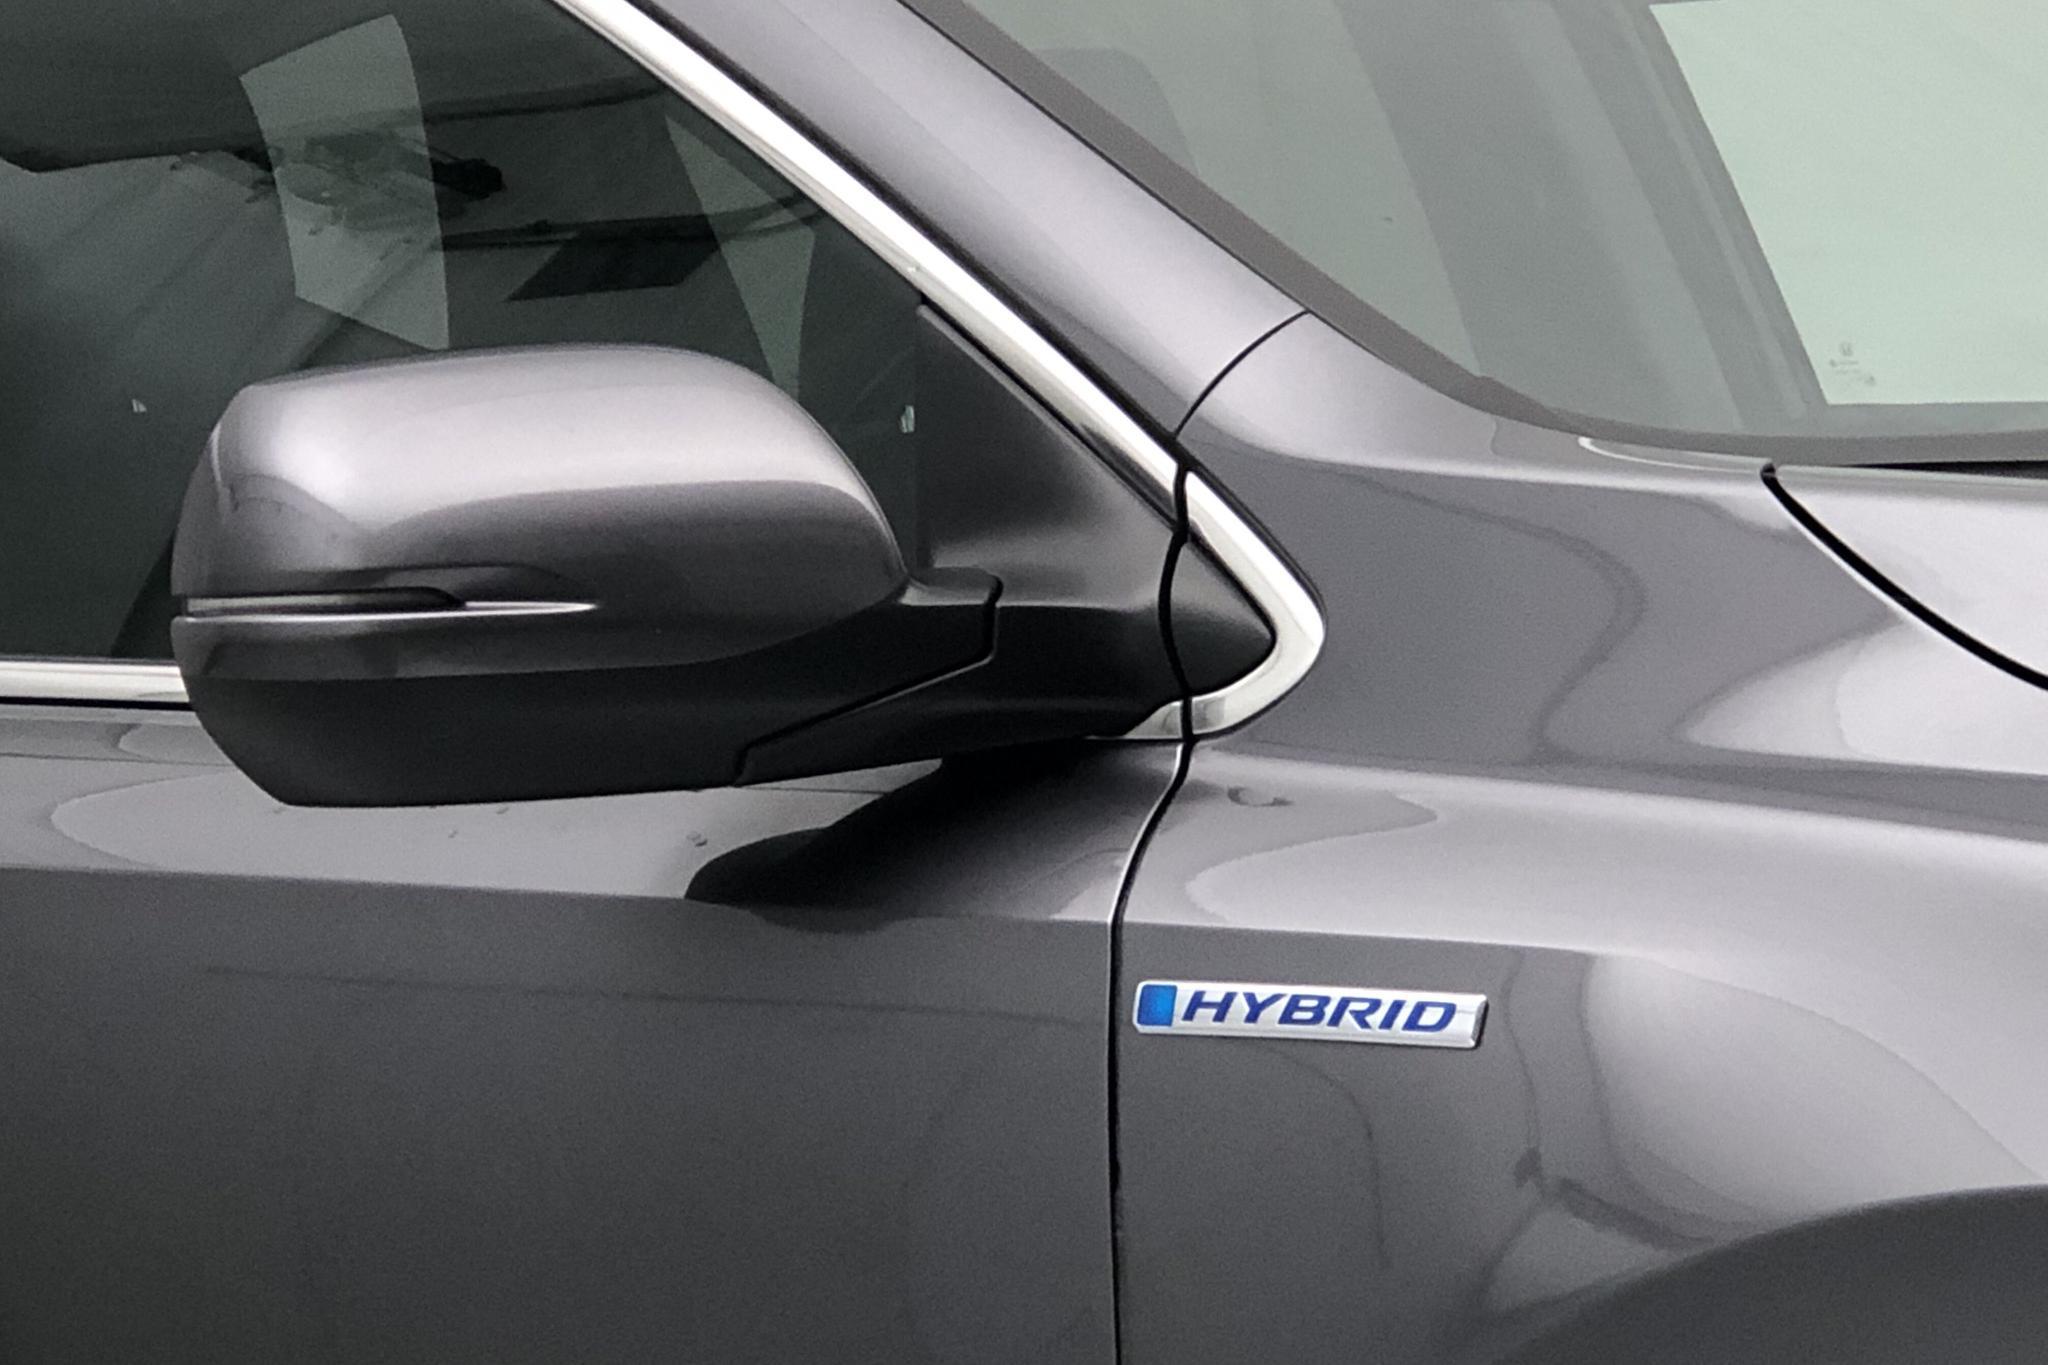 Honda CR-V 1.5 i-MMD 2WD (184hk) - 3 394 mil - Automat - Light Grey - 2019